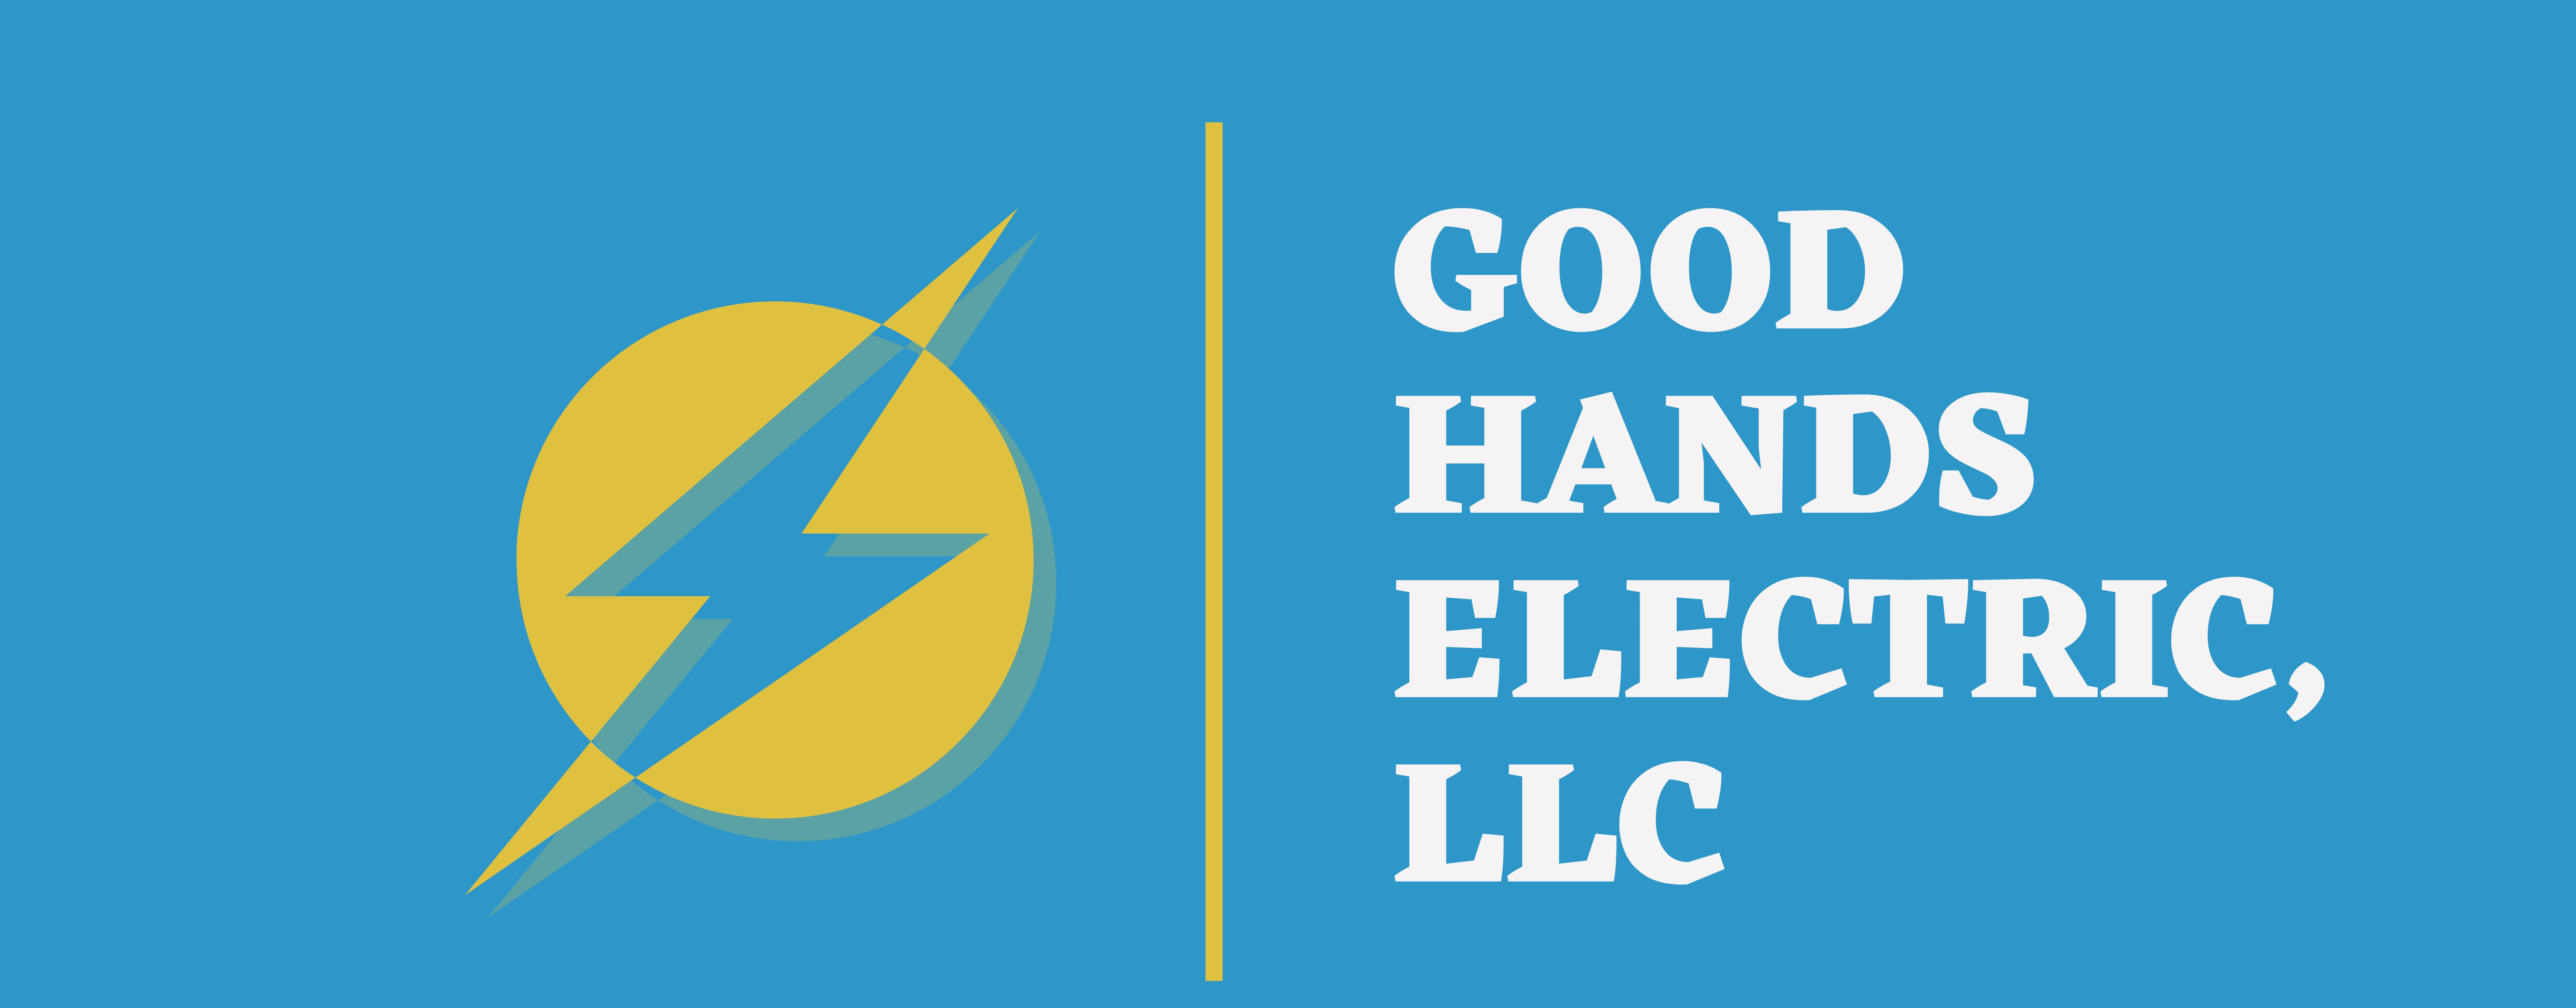 Good Hands Electric LLC